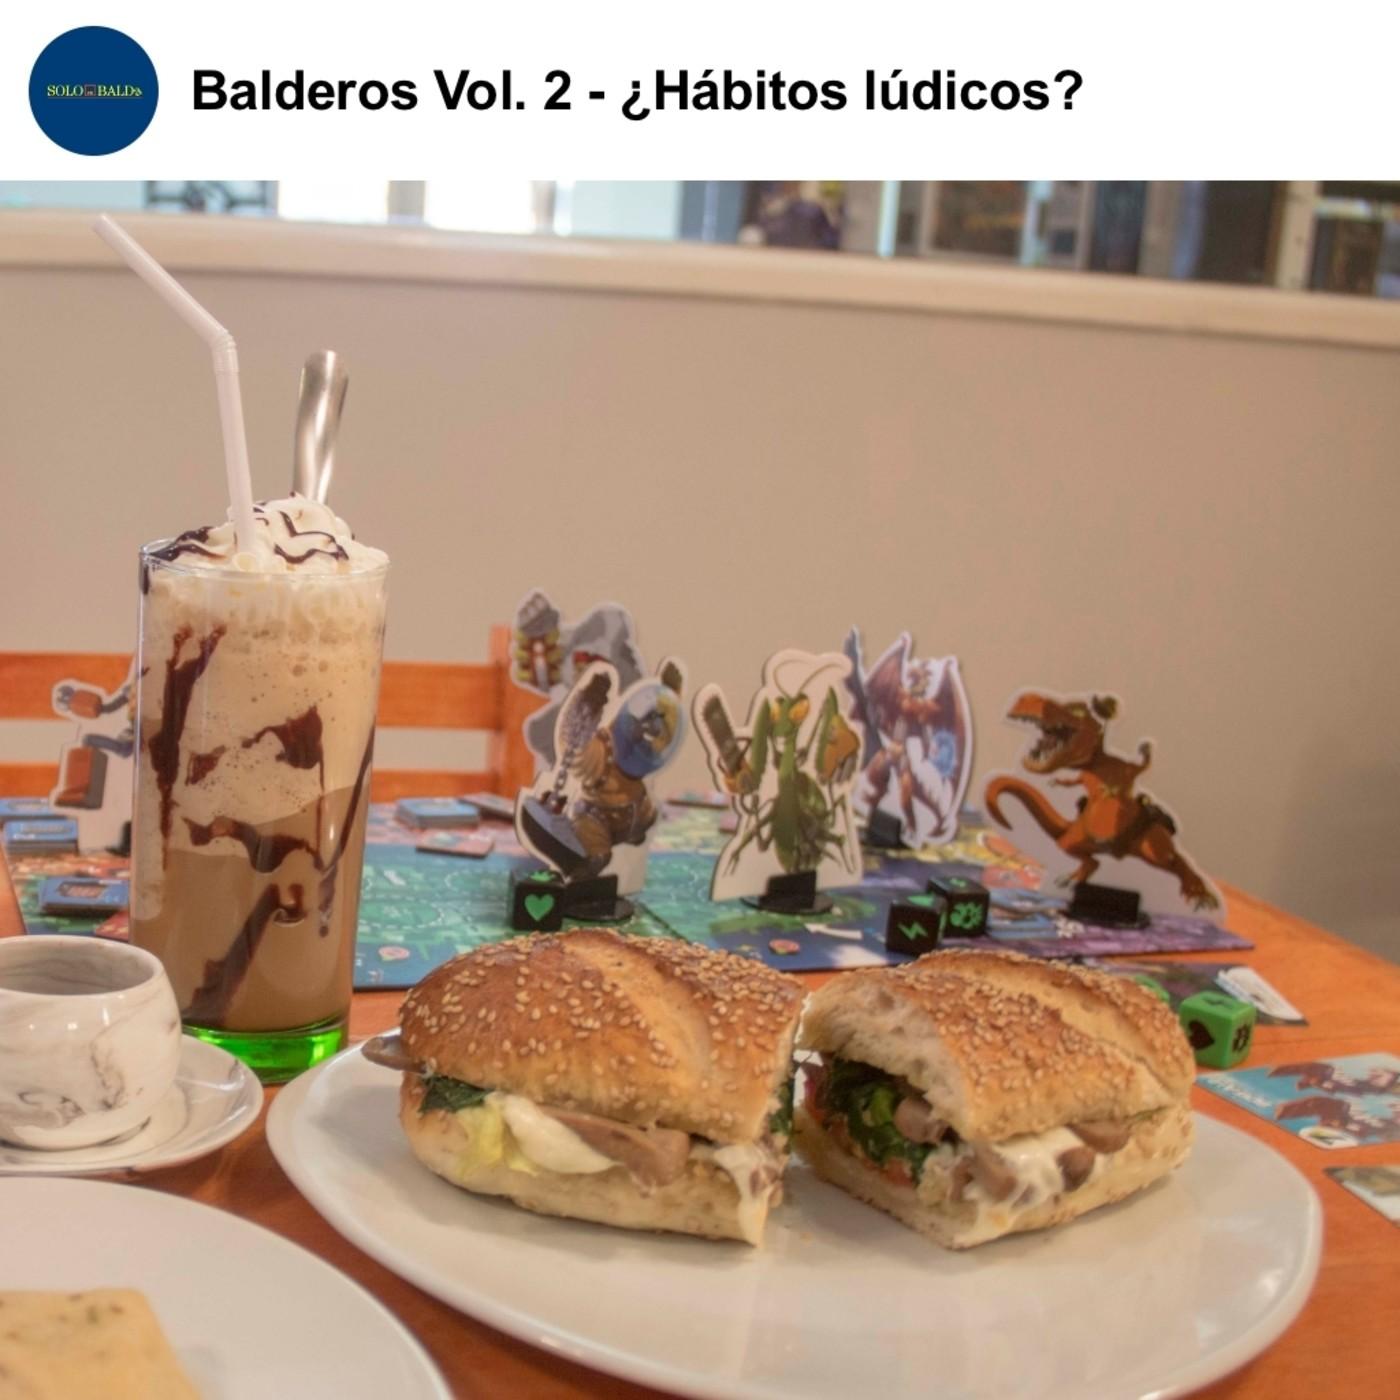 Balderos Vol. 2: ¿Hábitos lúdicos?